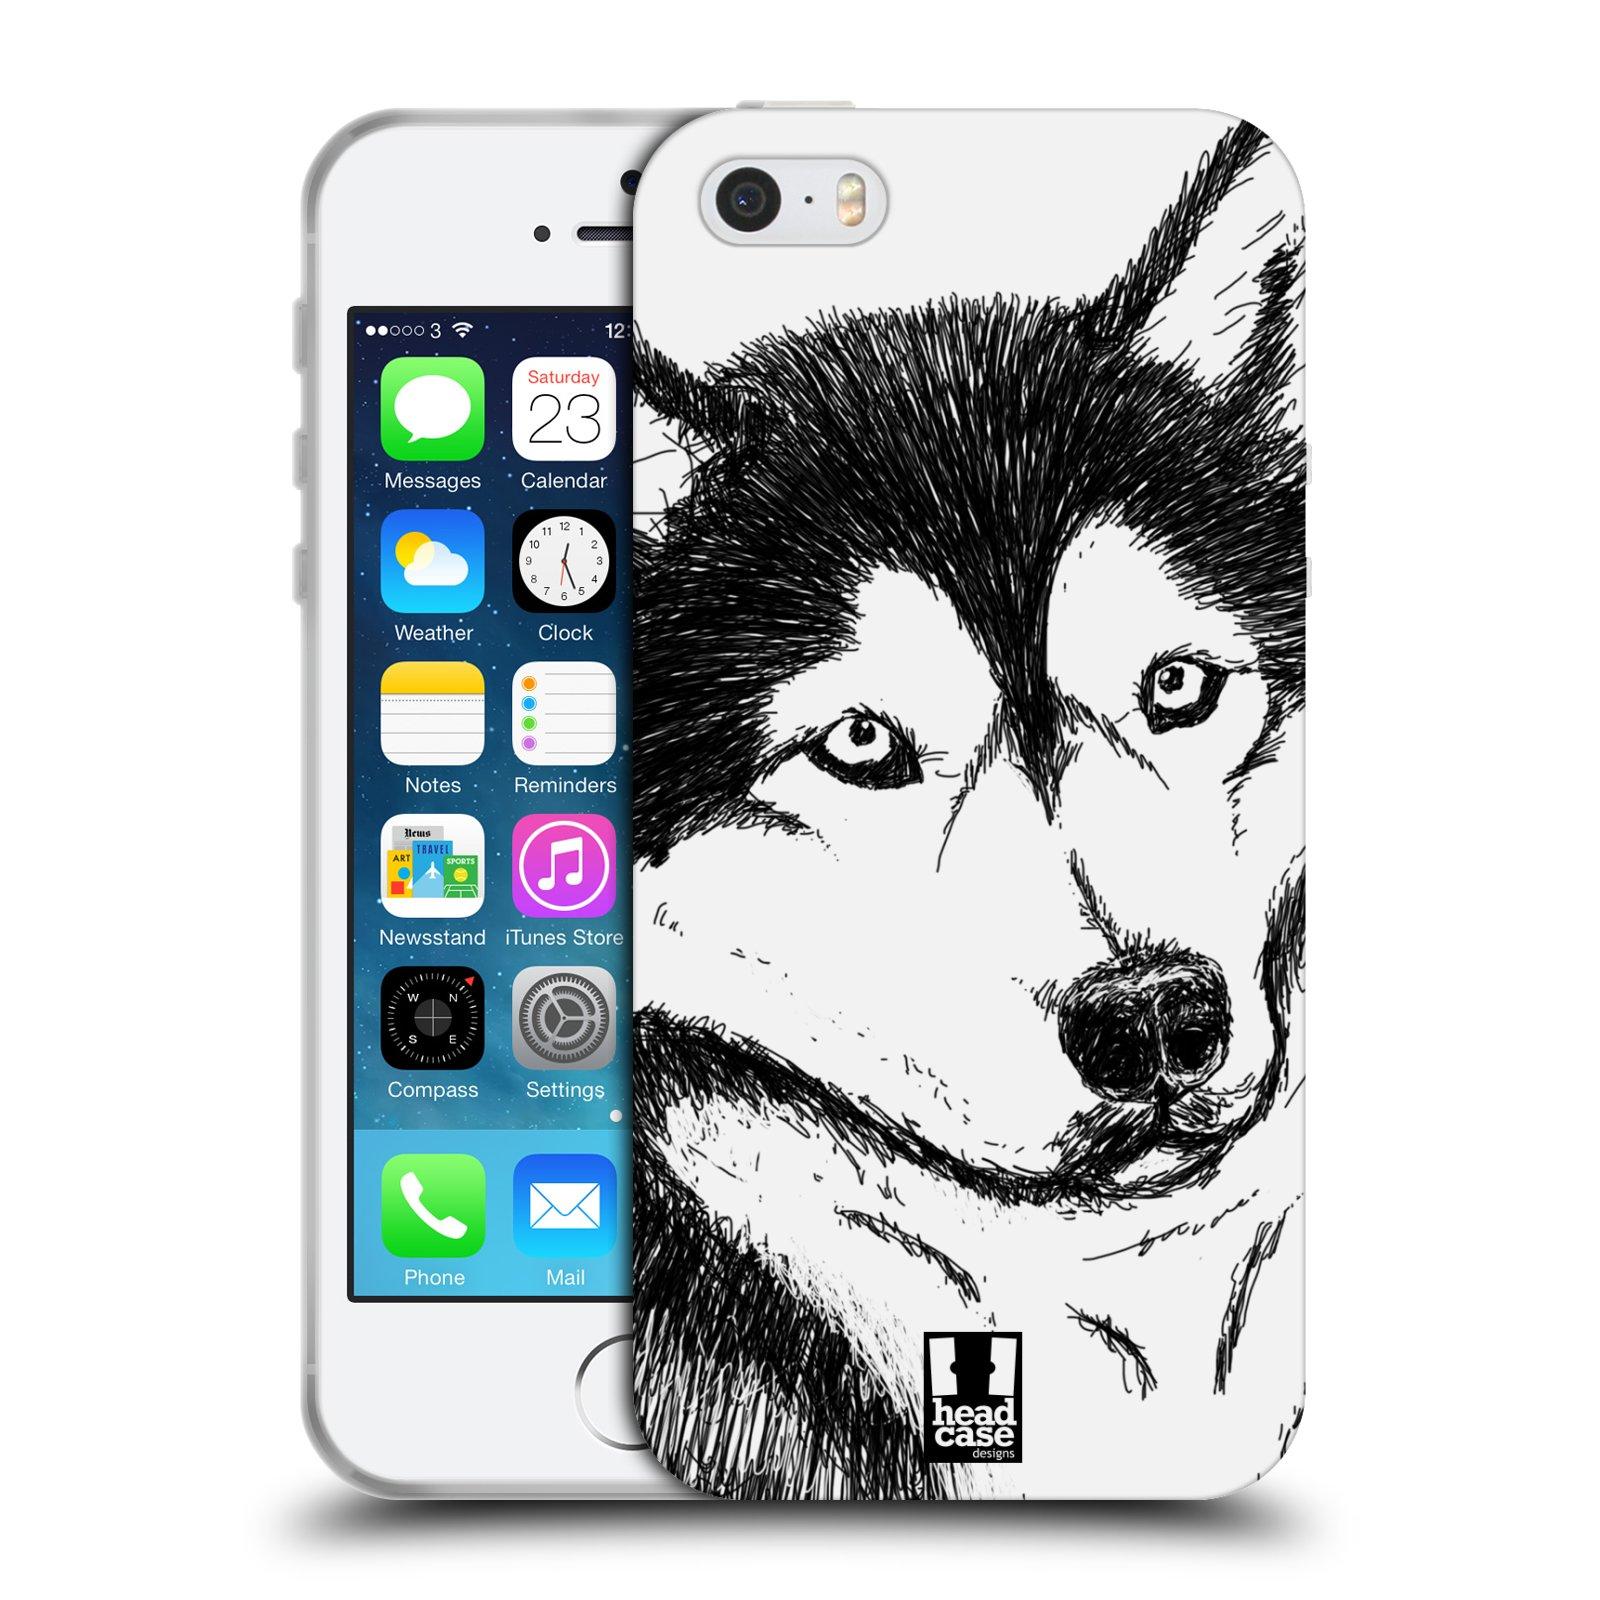 HEAD CASE silikonový obal na mobil Apple Iphone 5/5S vzor Kreslená zvířátka černá a bílá pes husky